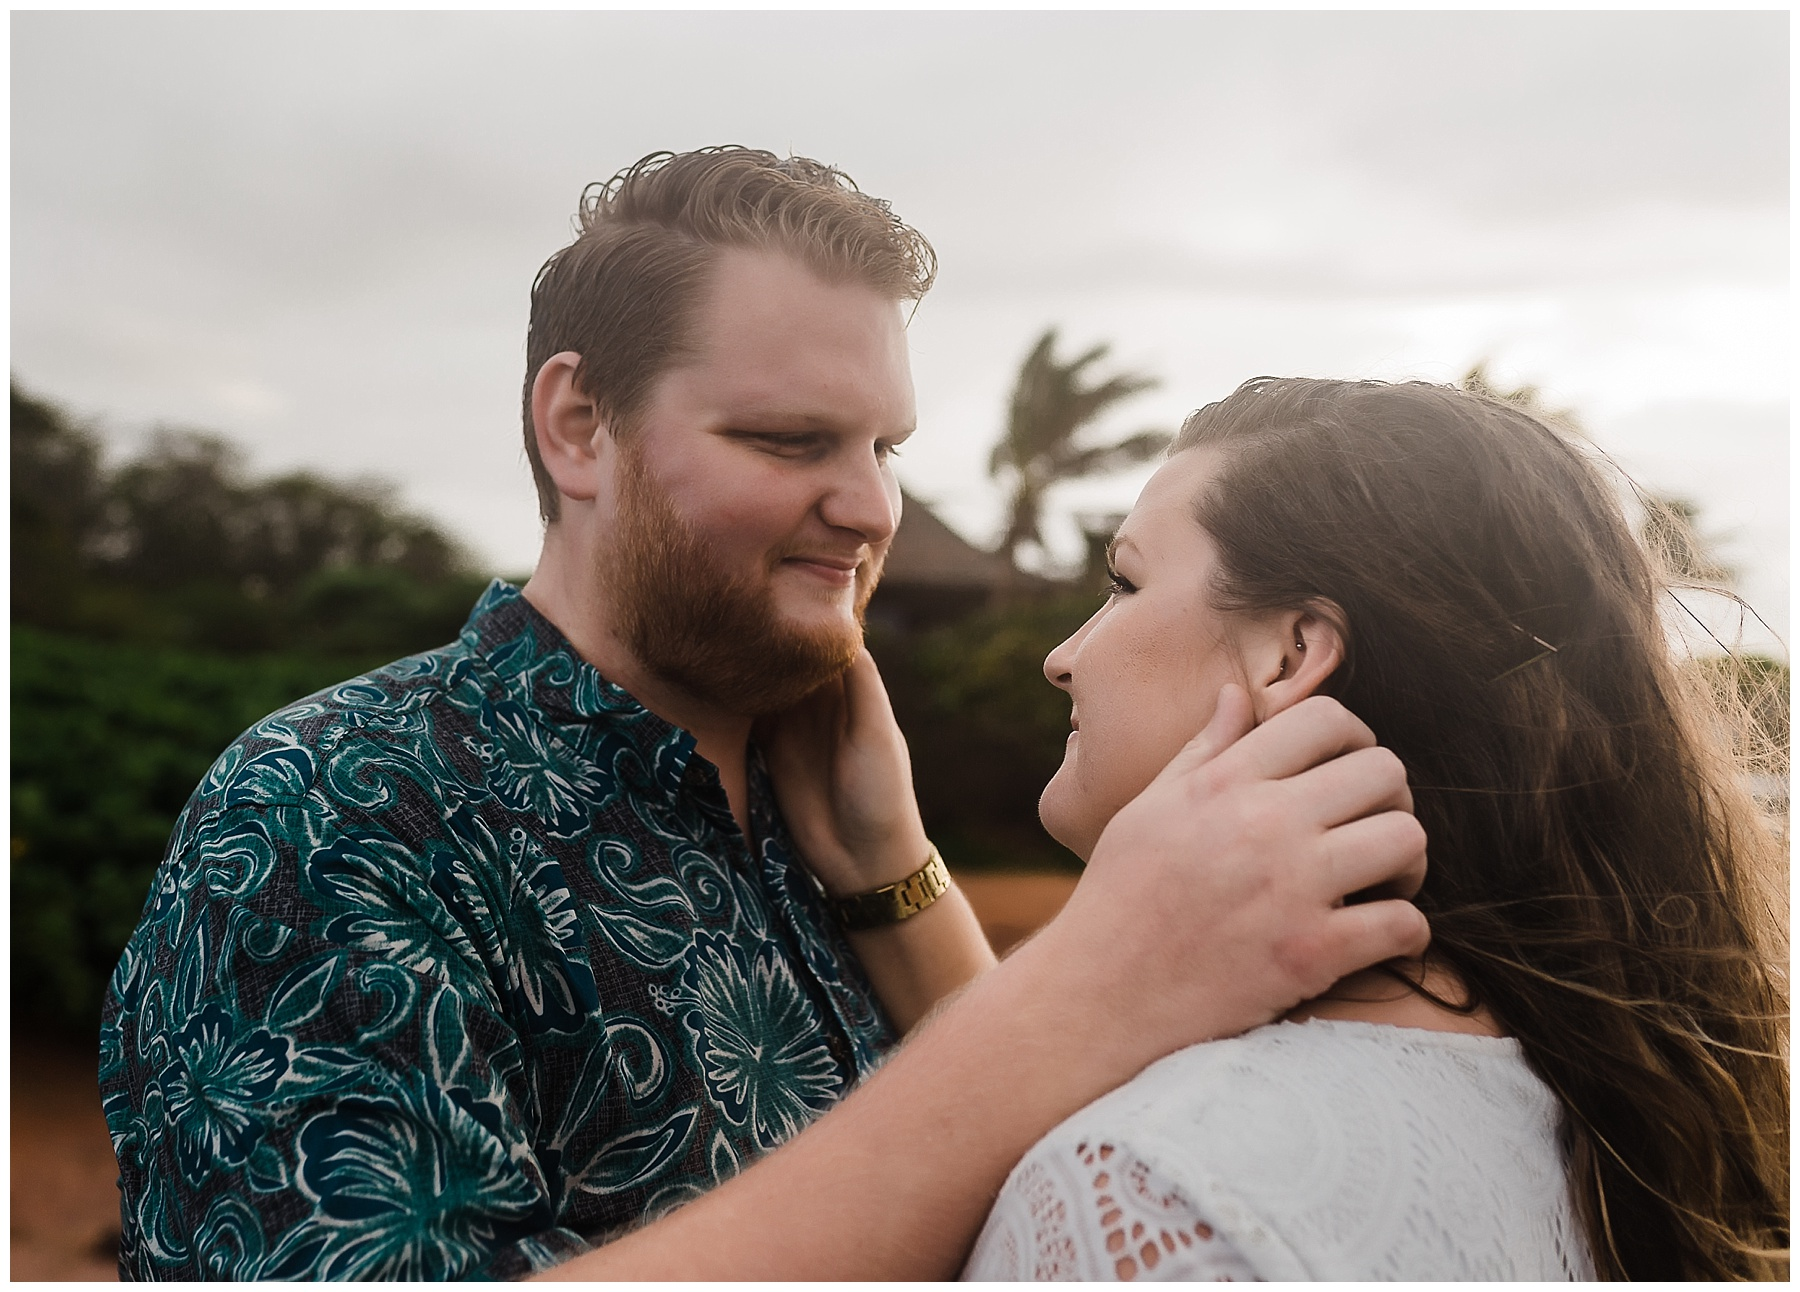 Cori & Christian - Maui, Hawaii Elopement